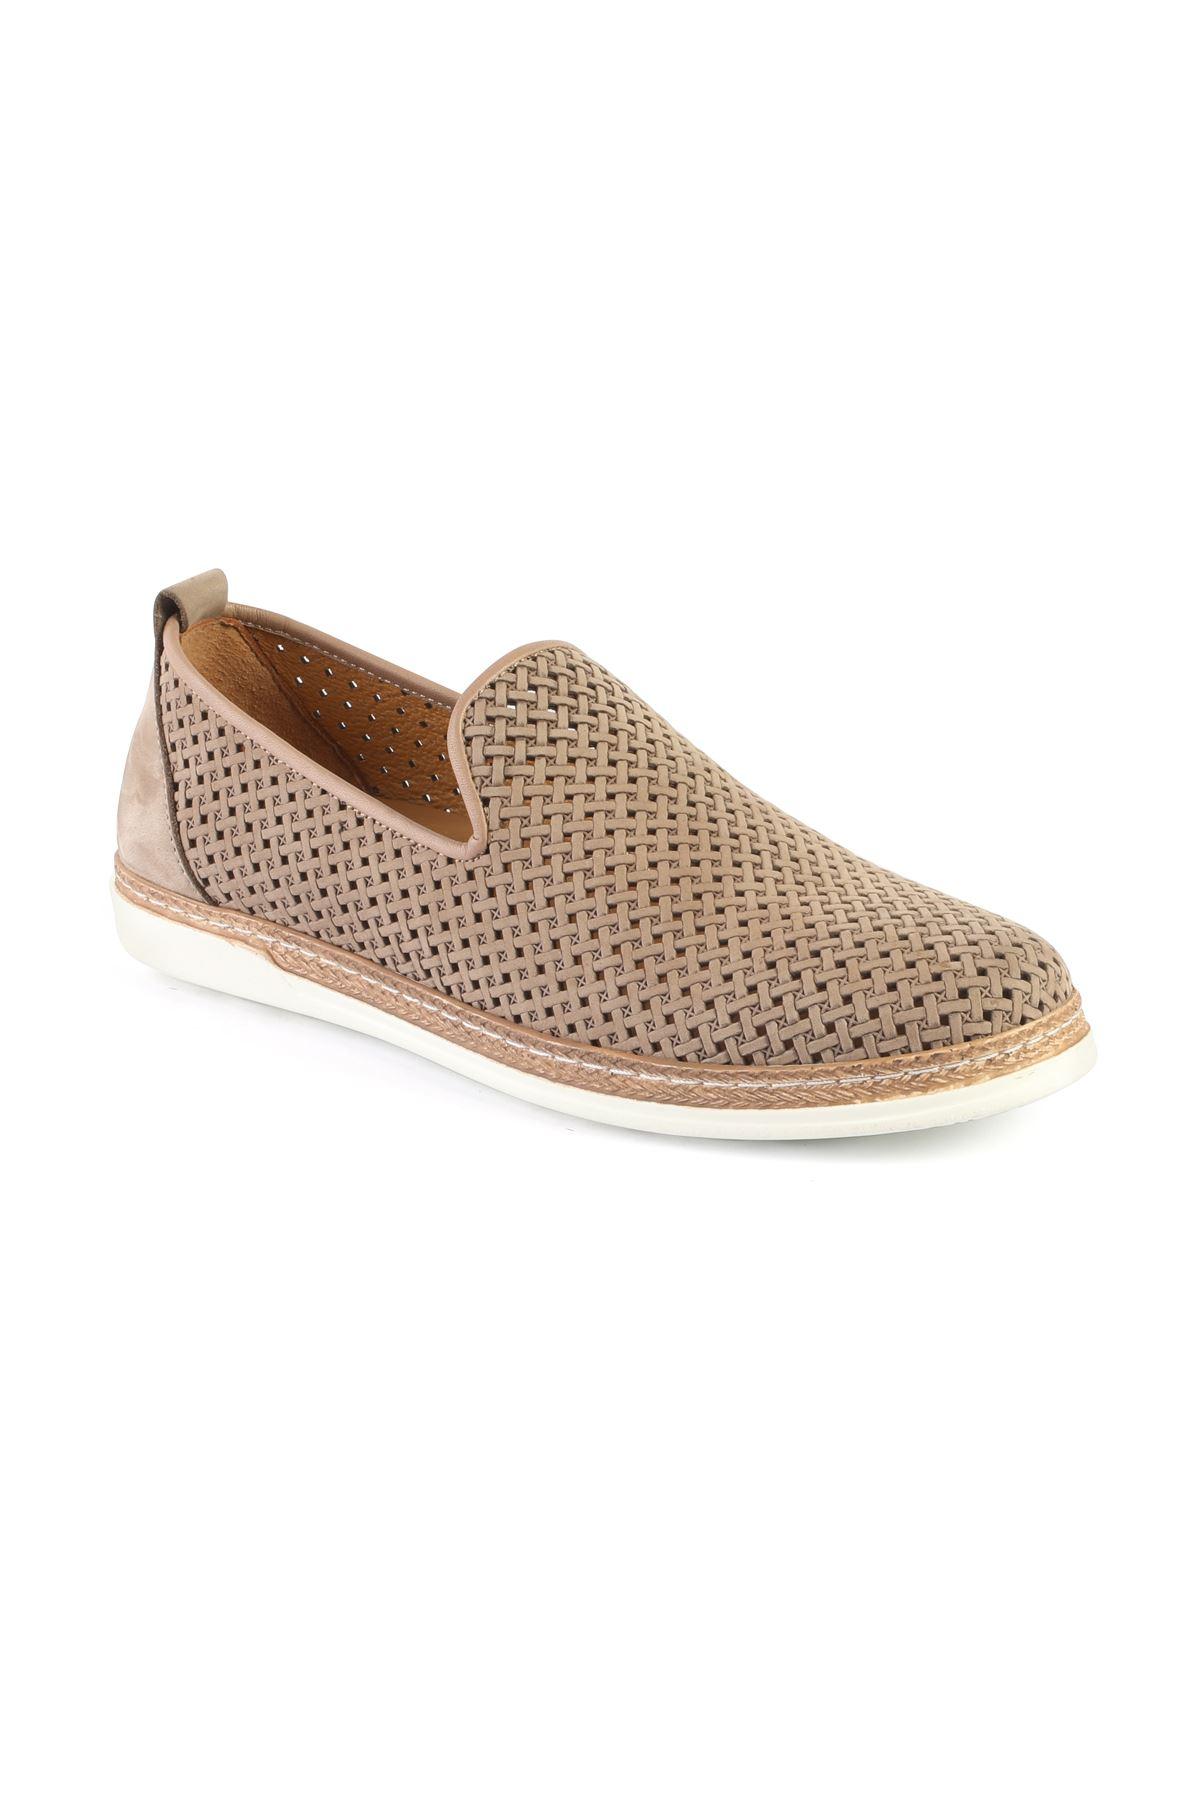 Libero 3397 Mink Loafer Shoes